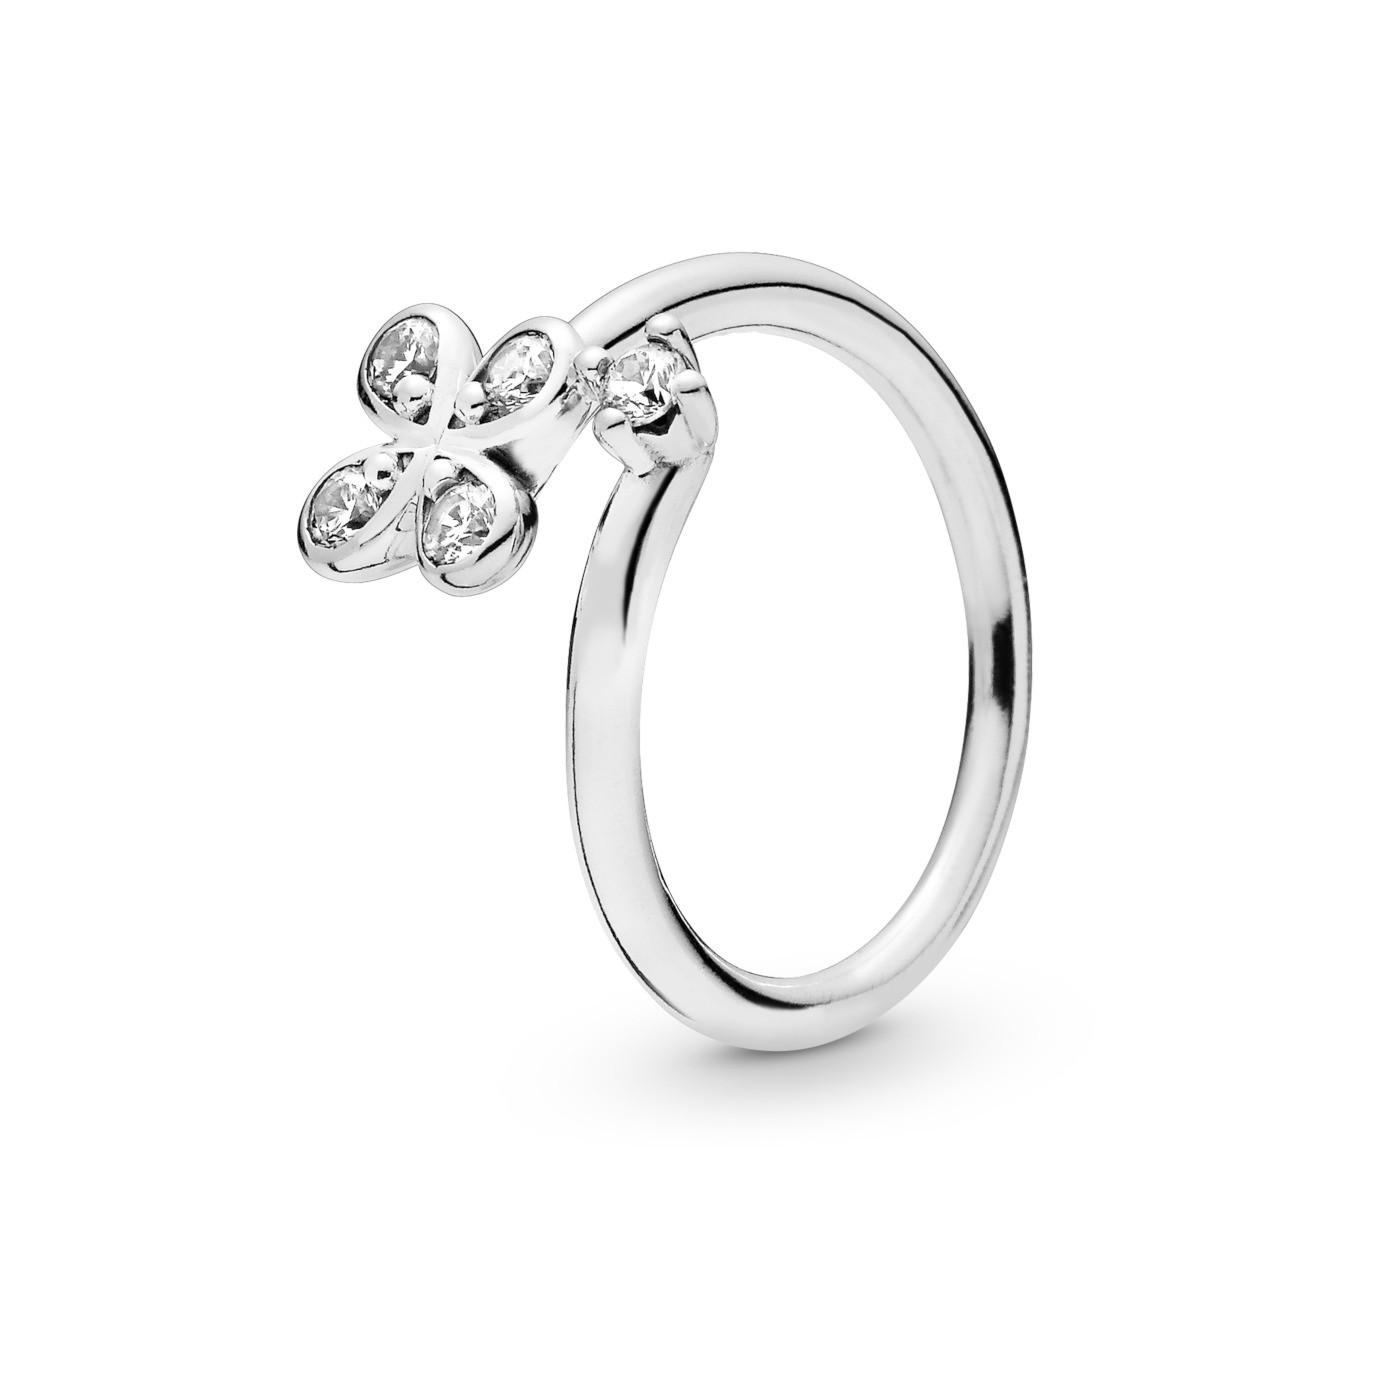 00684f610 Pandora Stories Ring 197988CZ - Jewelry